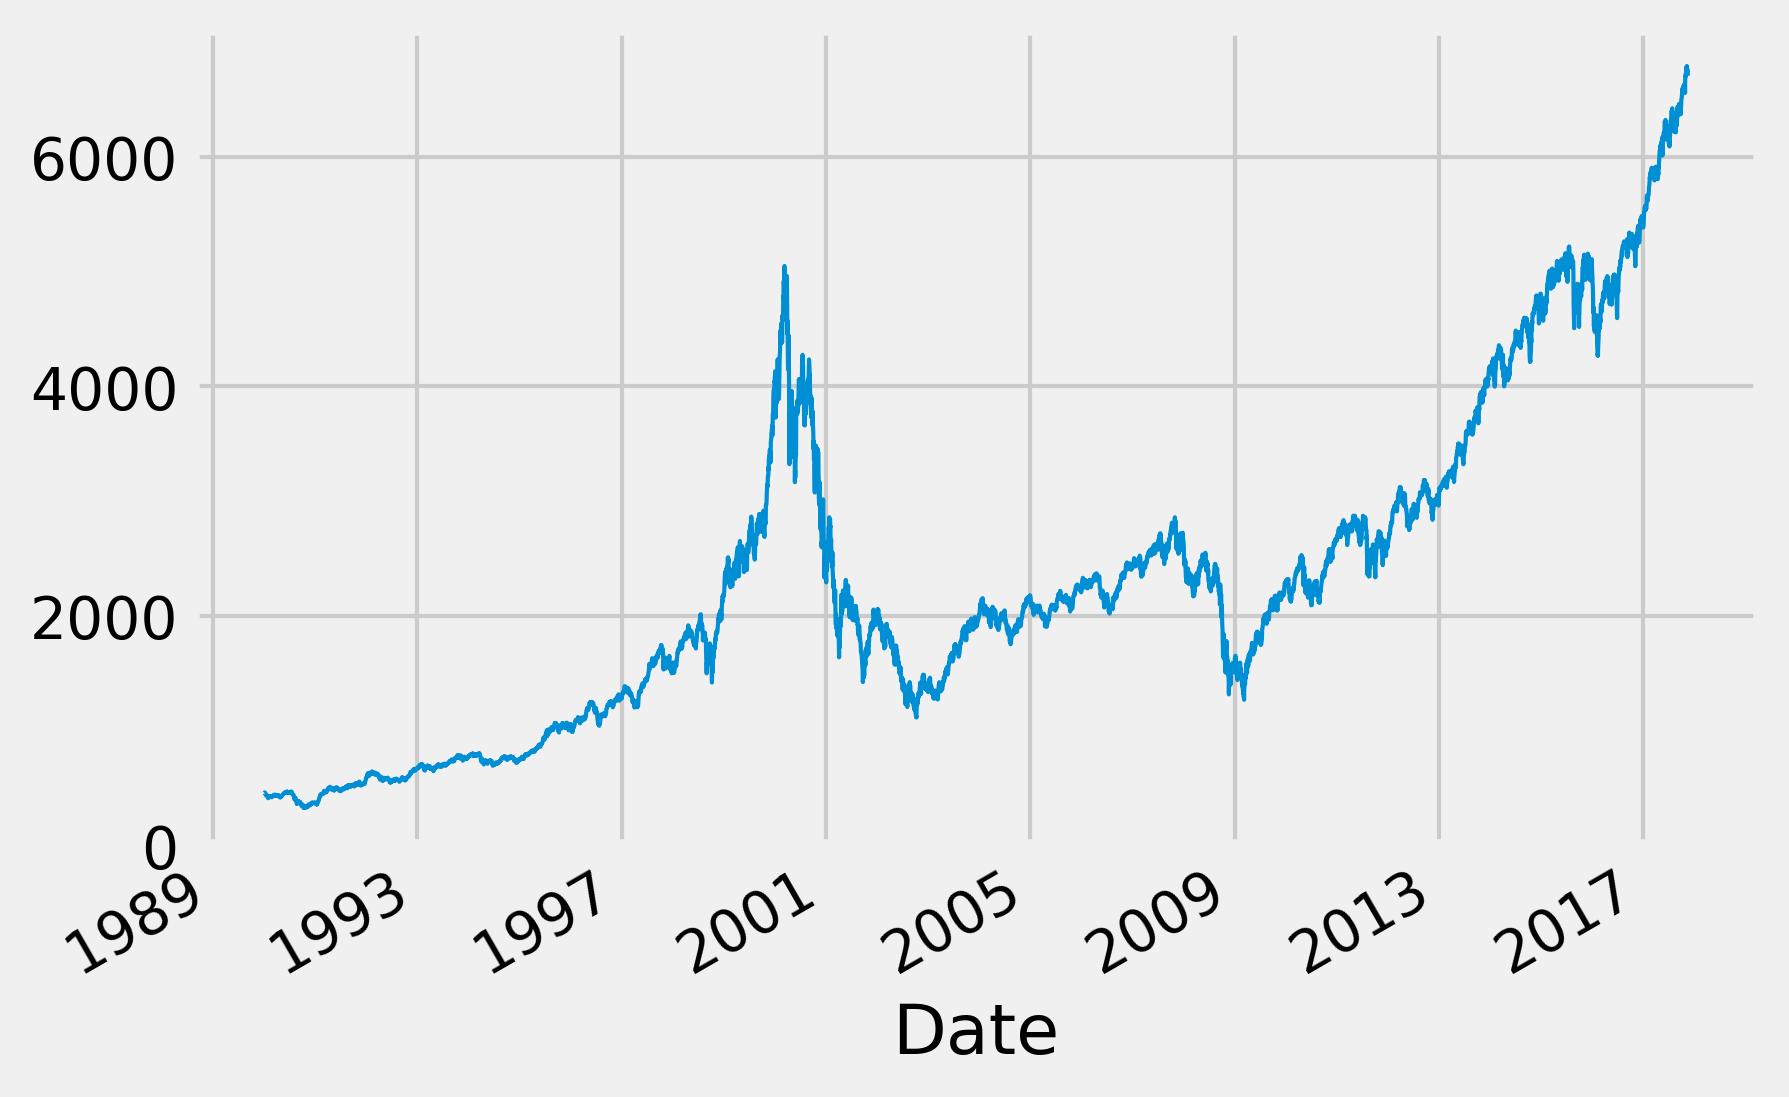 <matplotlib.figure.Figure at 0x1204bcf8>